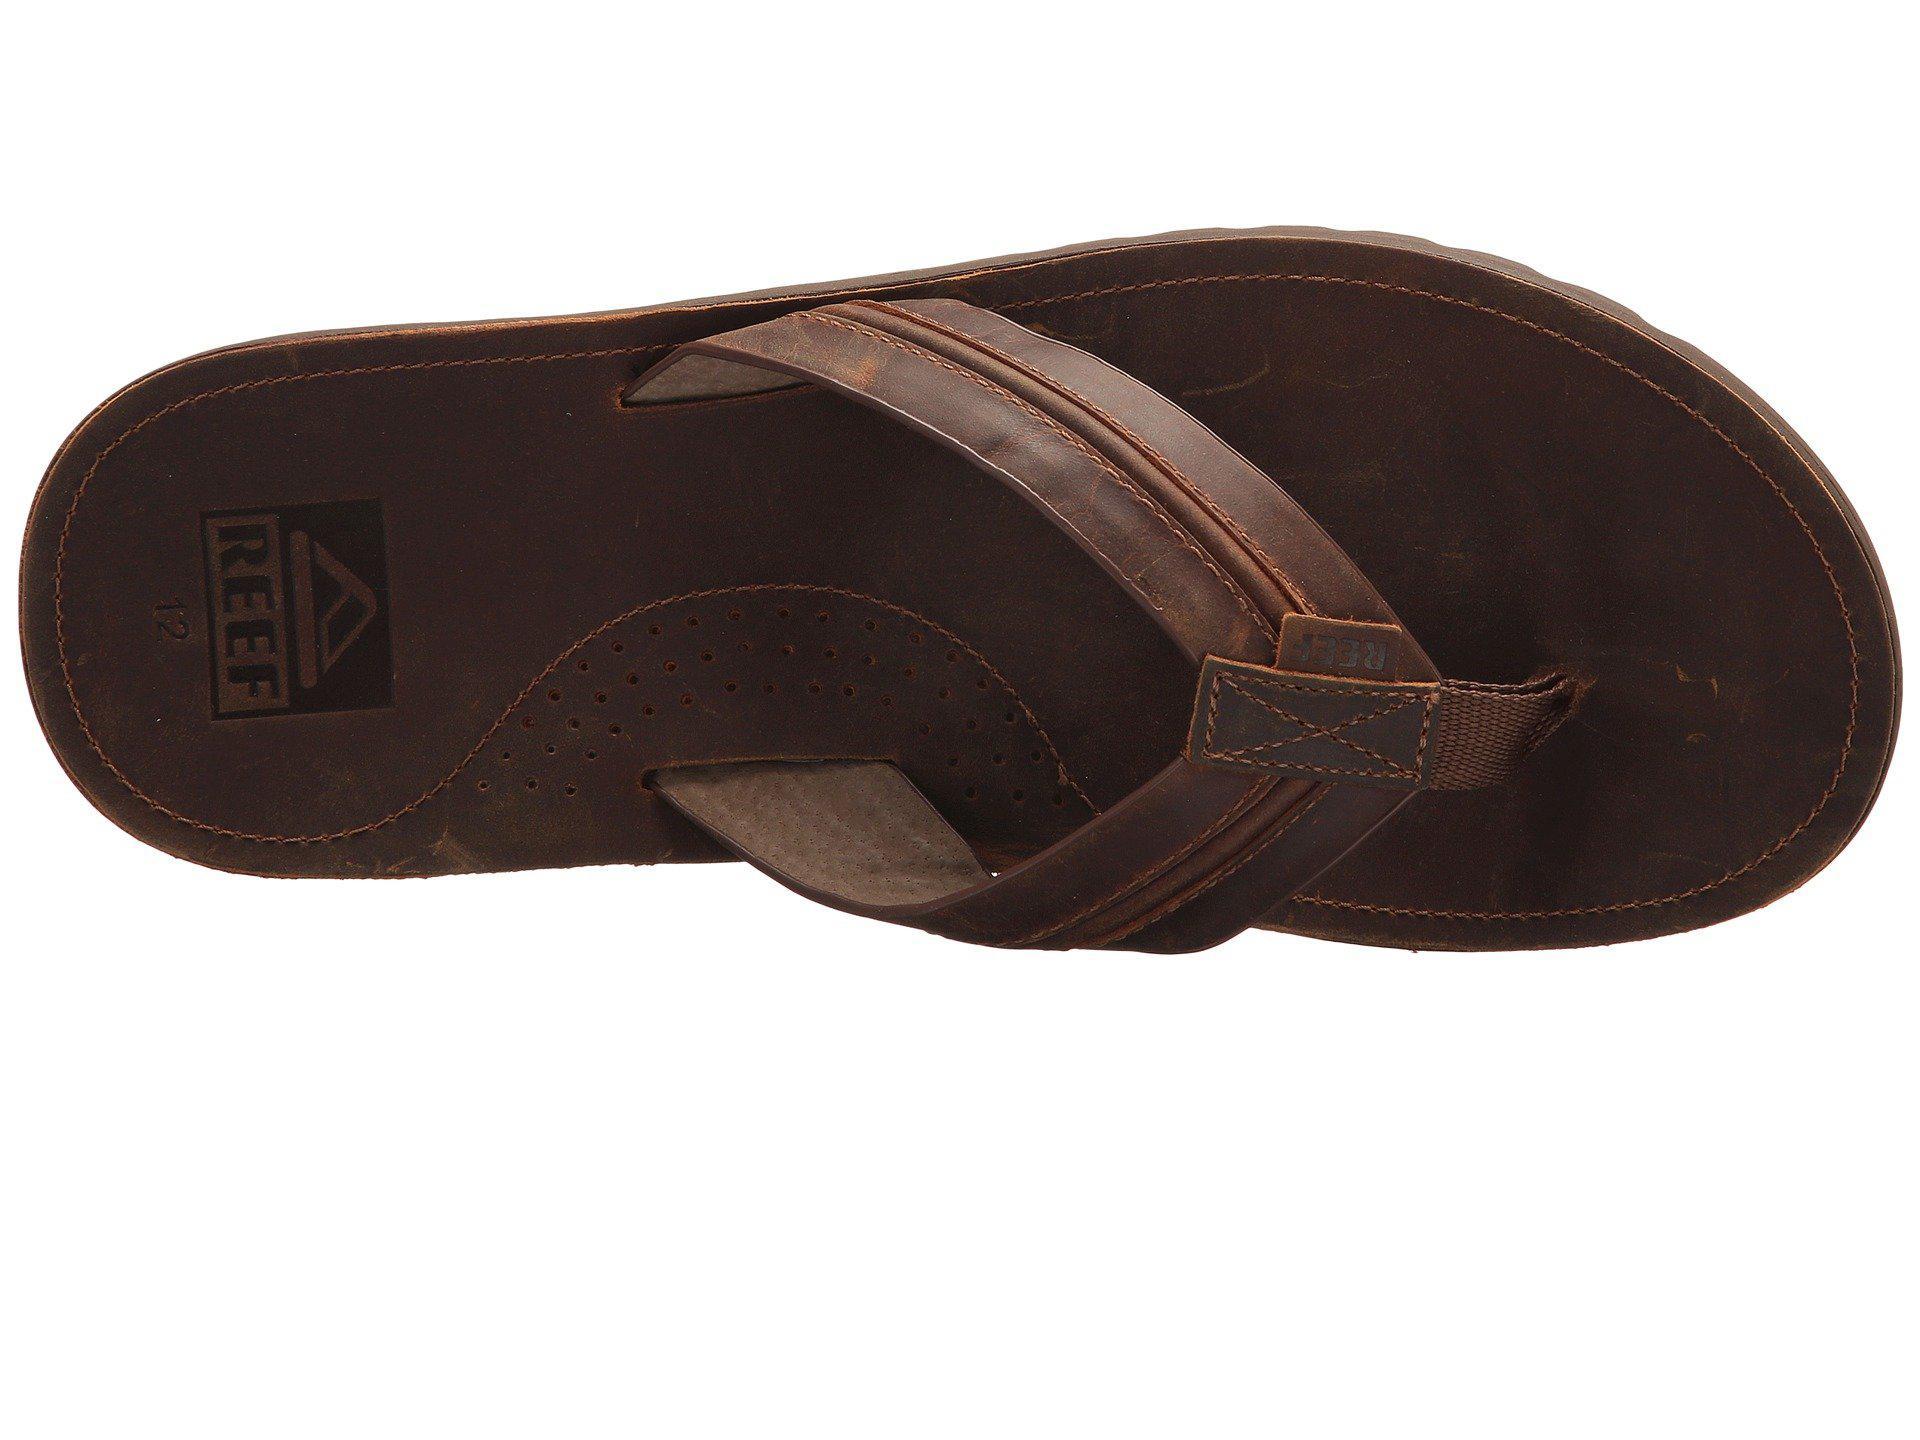 0c9db3f75f04 Reef - Voyage Lux (brown brown) Men s Sandals for Men - Lyst. View  fullscreen